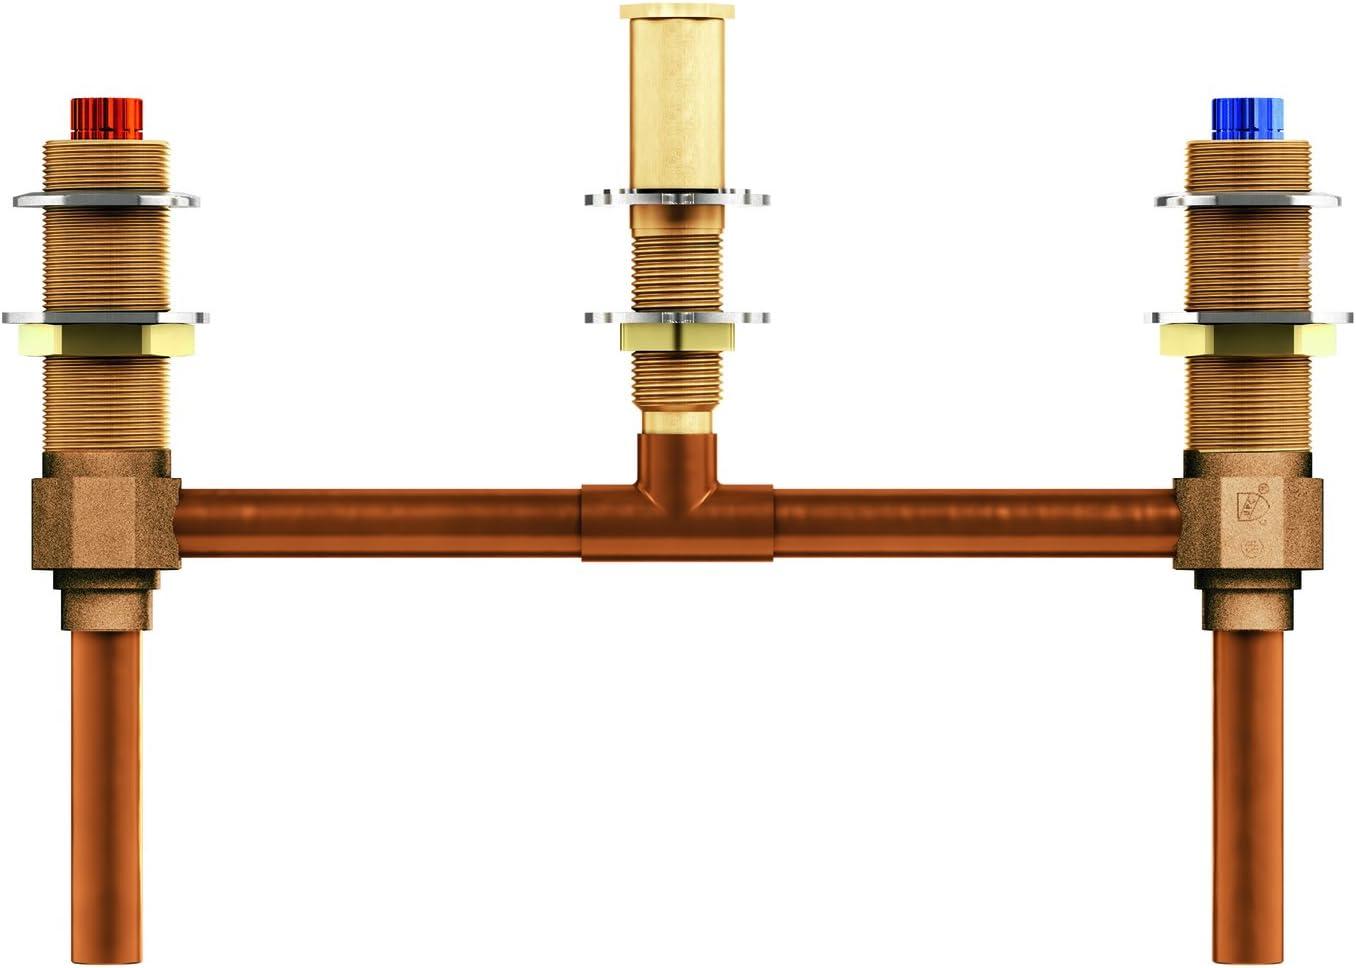 Moen 4796 Two Handle Roman Tub Valve 10-Inch Center 1//2-Inch CC Connection